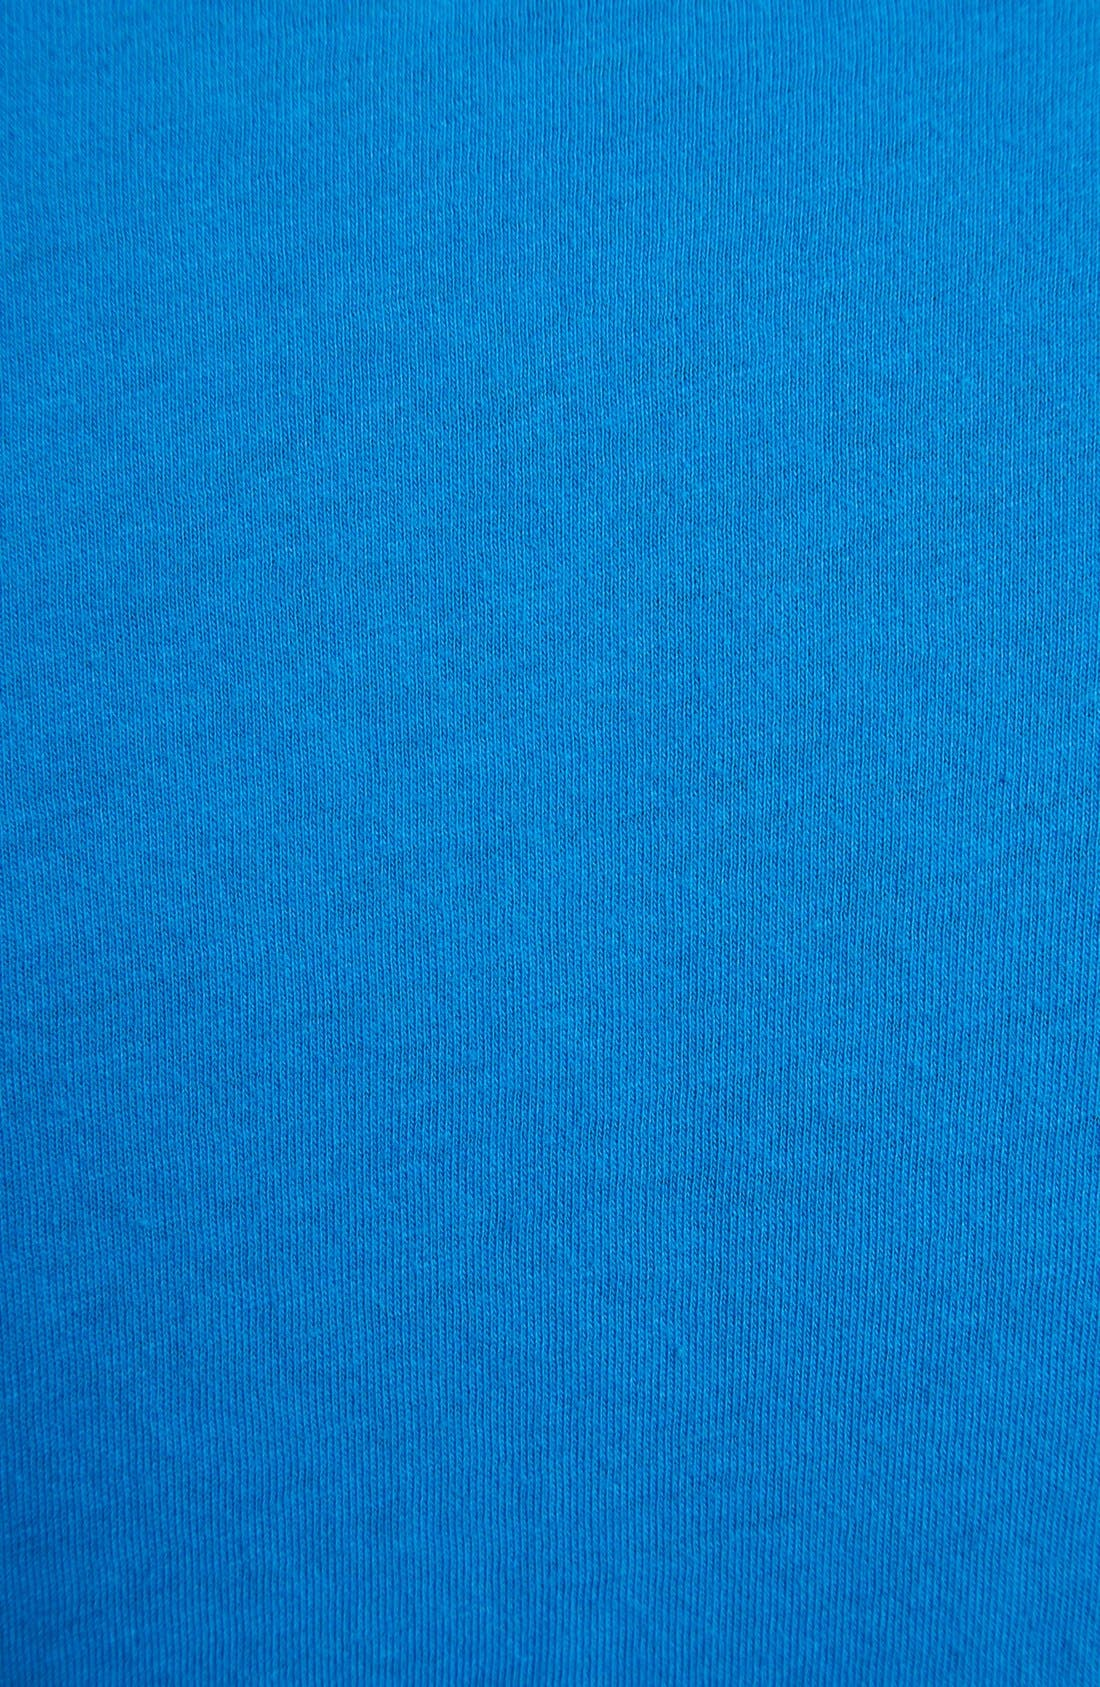 Alternate Image 3  - Topo Ranch 'Gem' T-Shirt